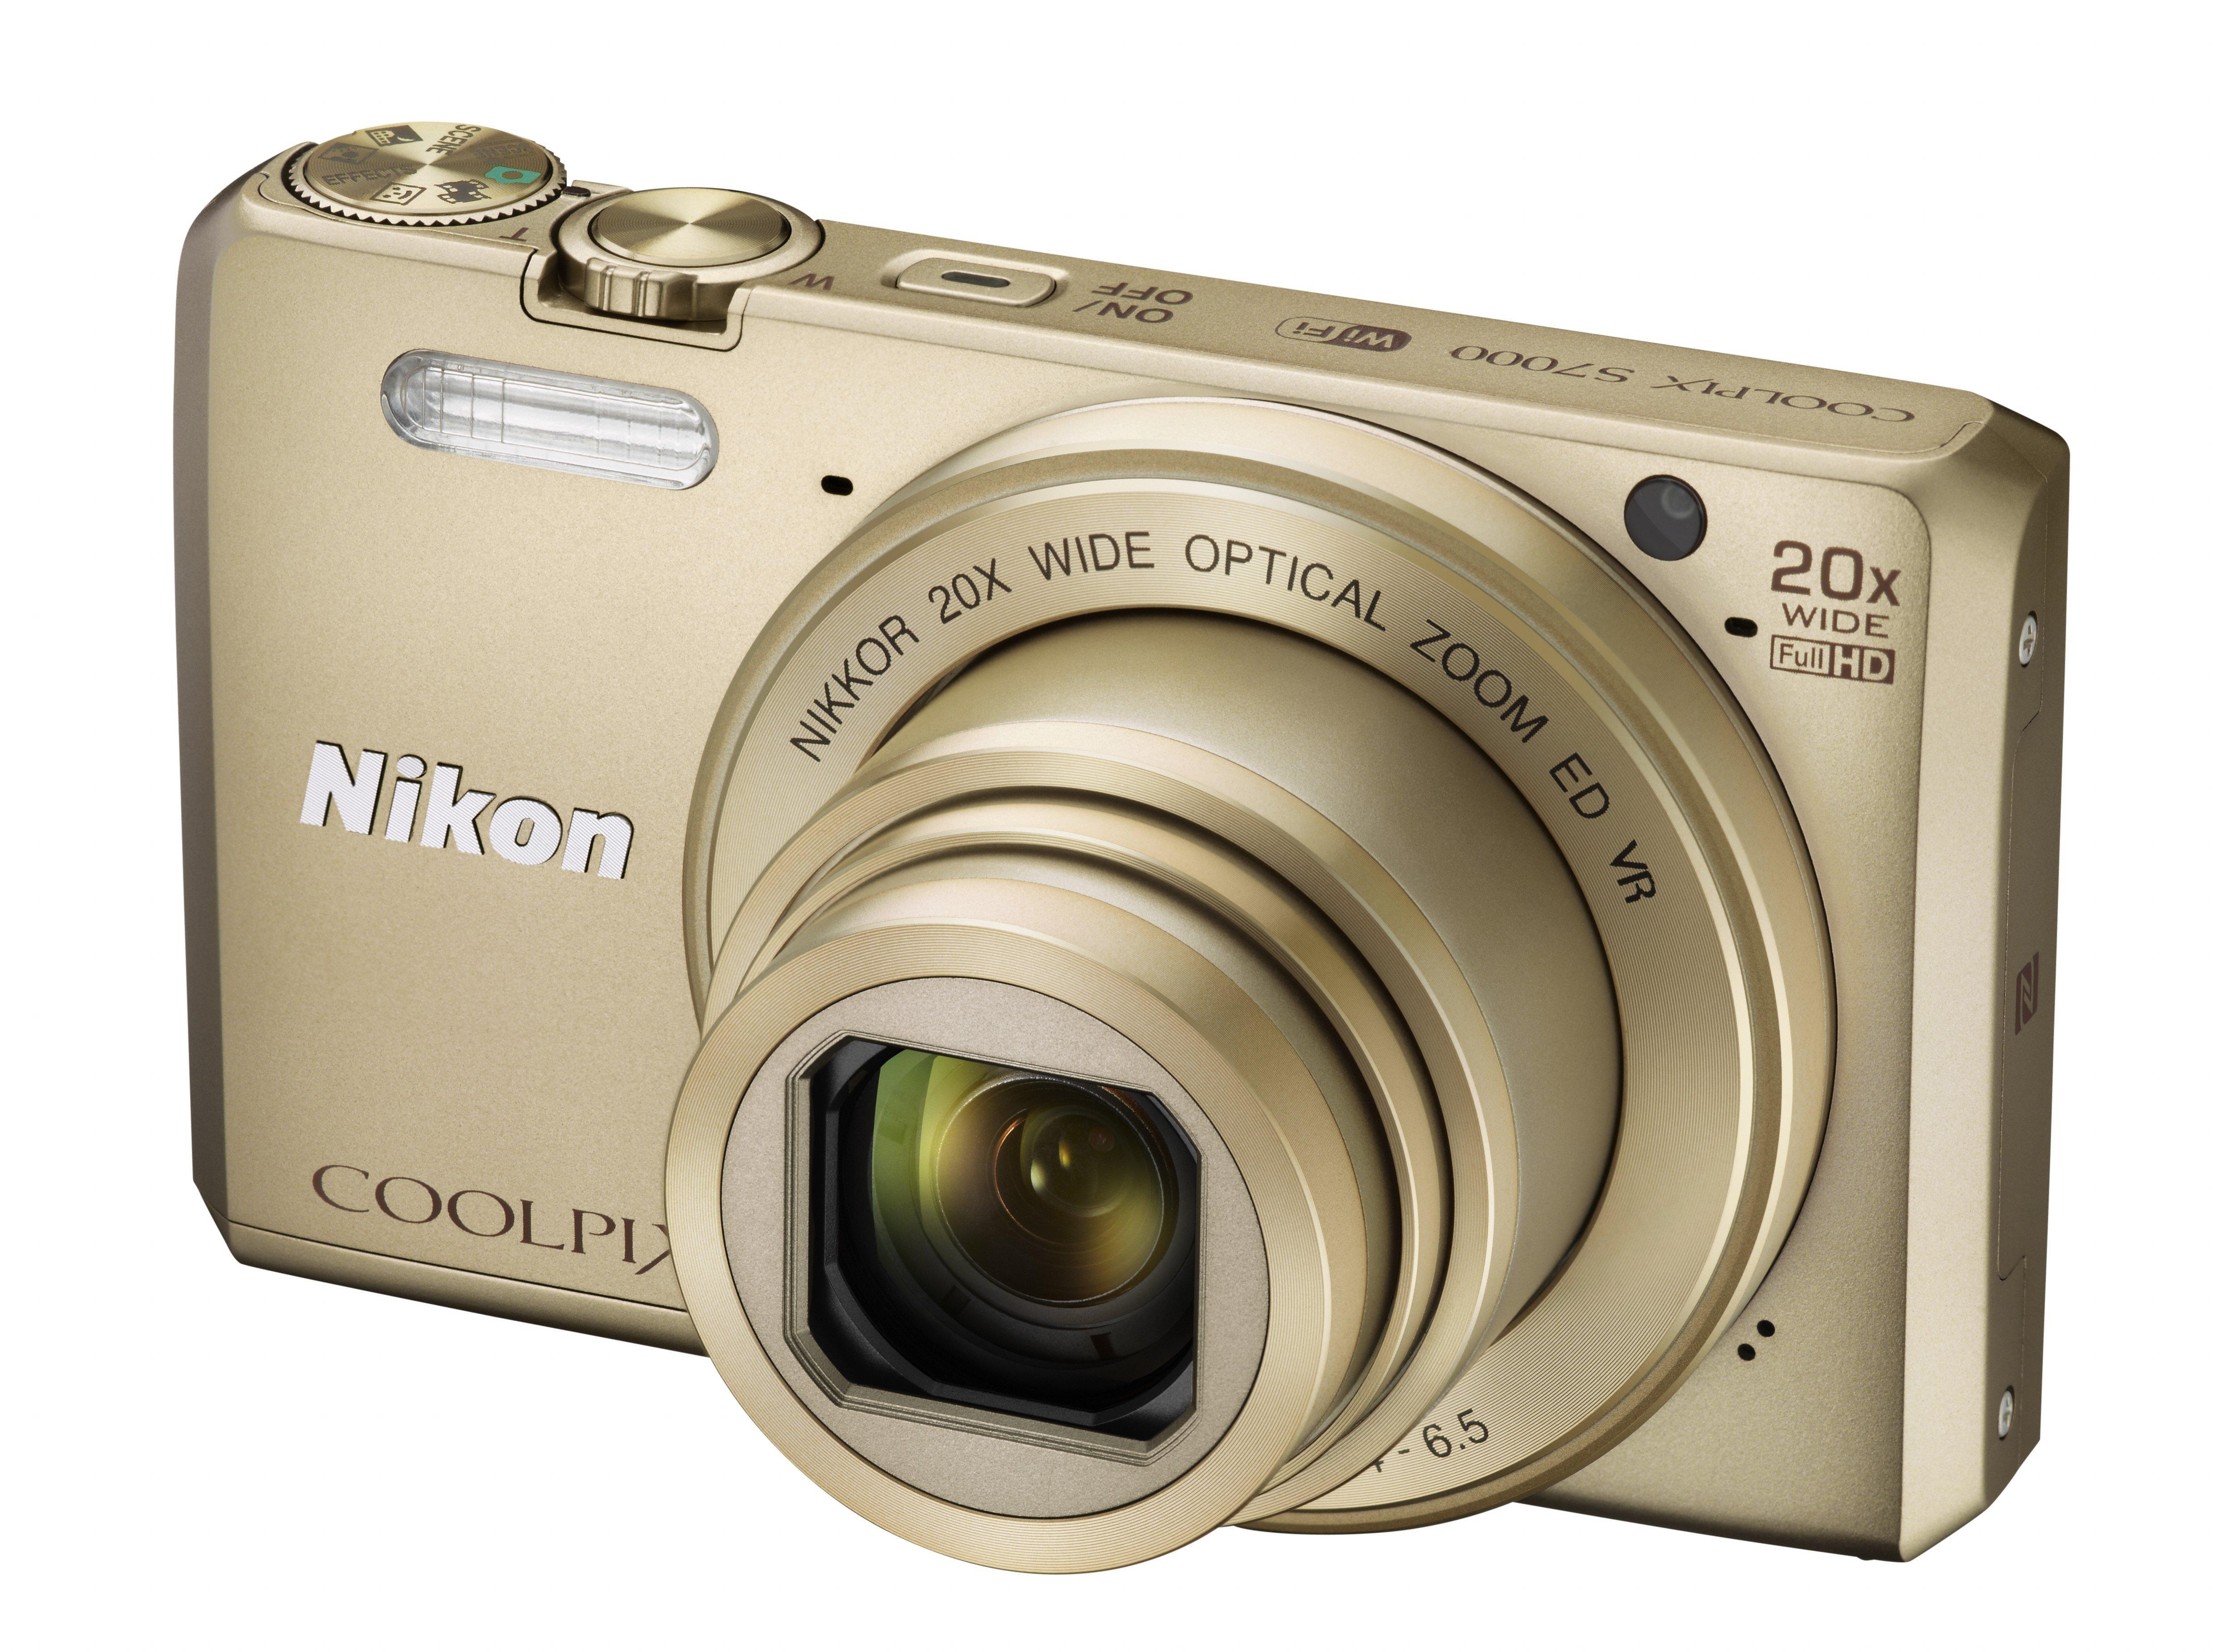 NIKON COOLPIX S7000 zlatý + SDHC 8 GB + originální pouzdro zdarma